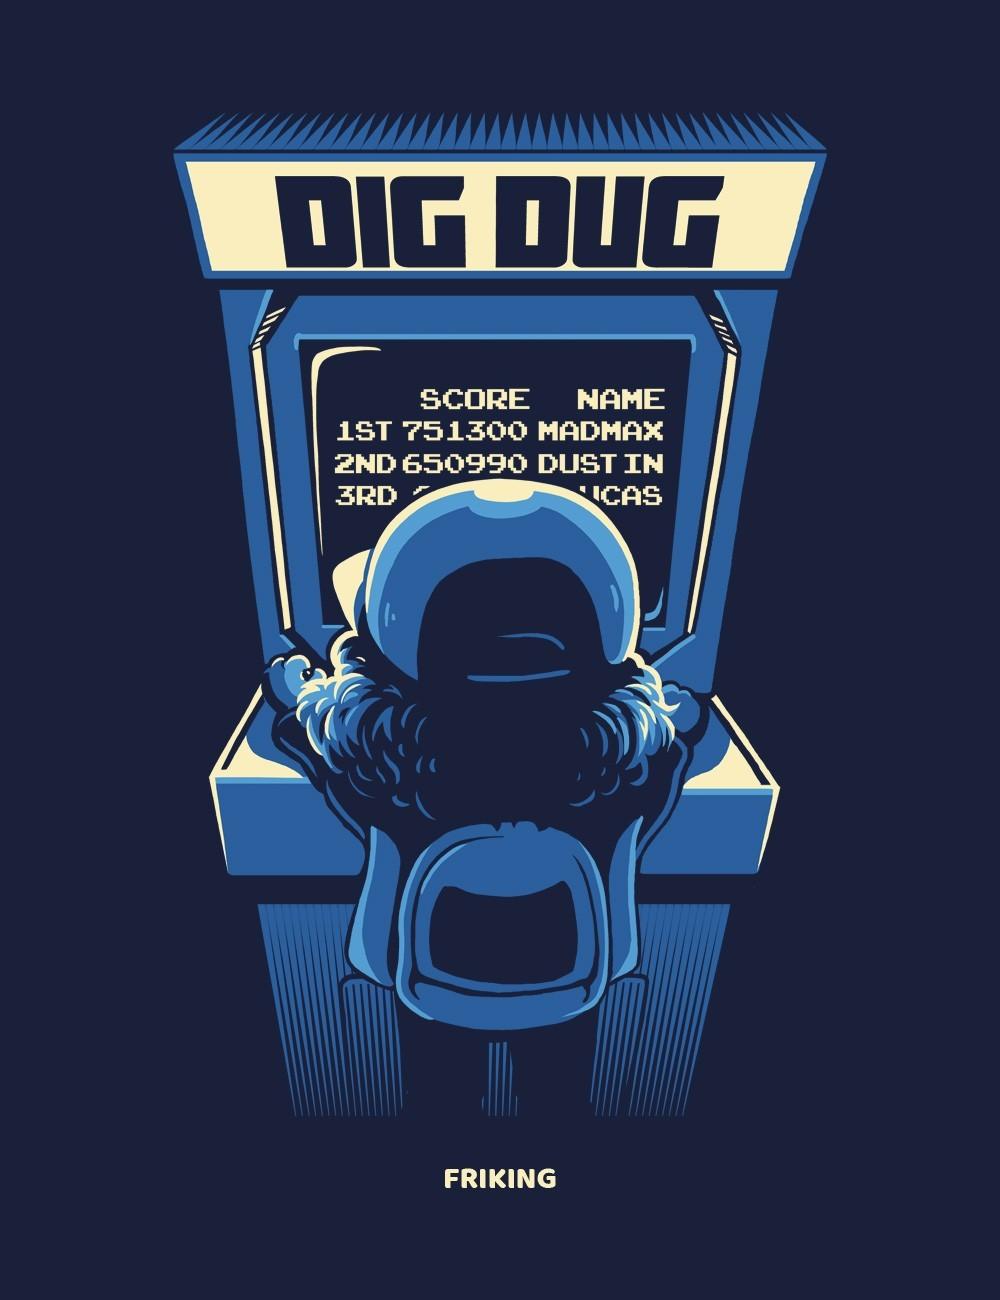 Dig-dug